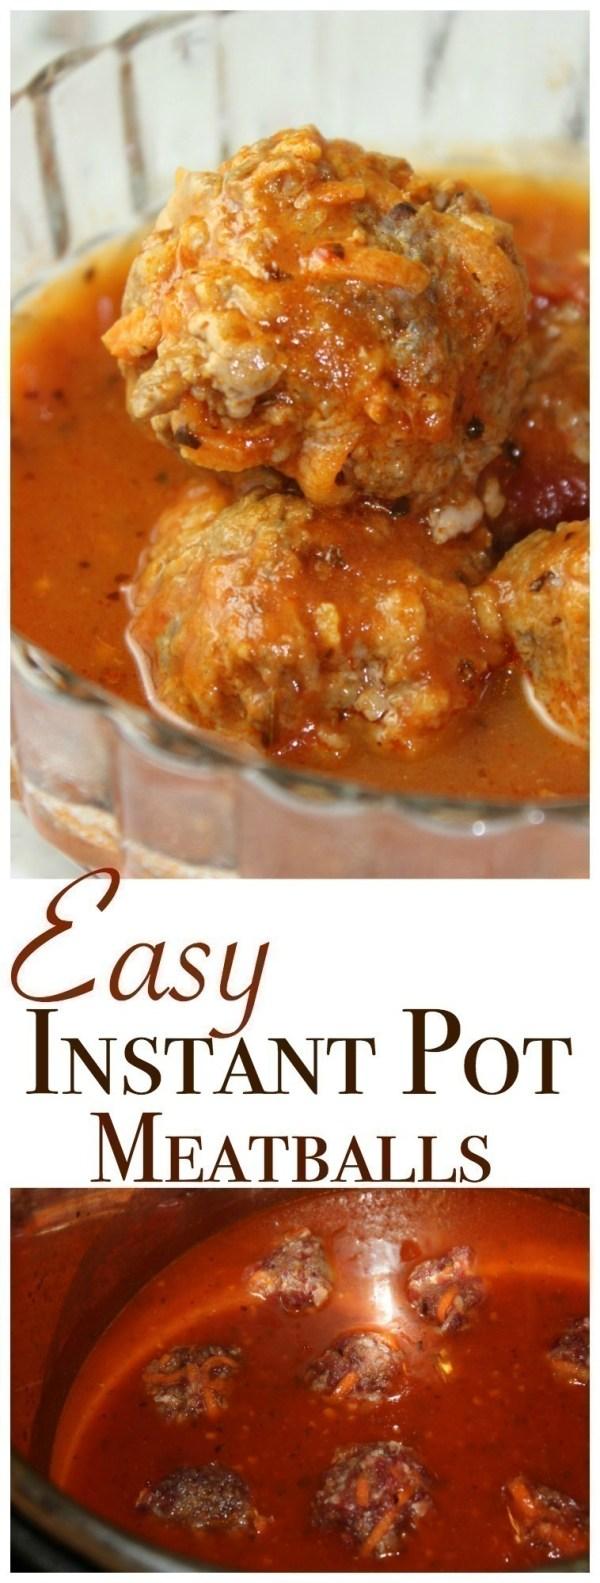 EASY Meatballs in the Instant Pot